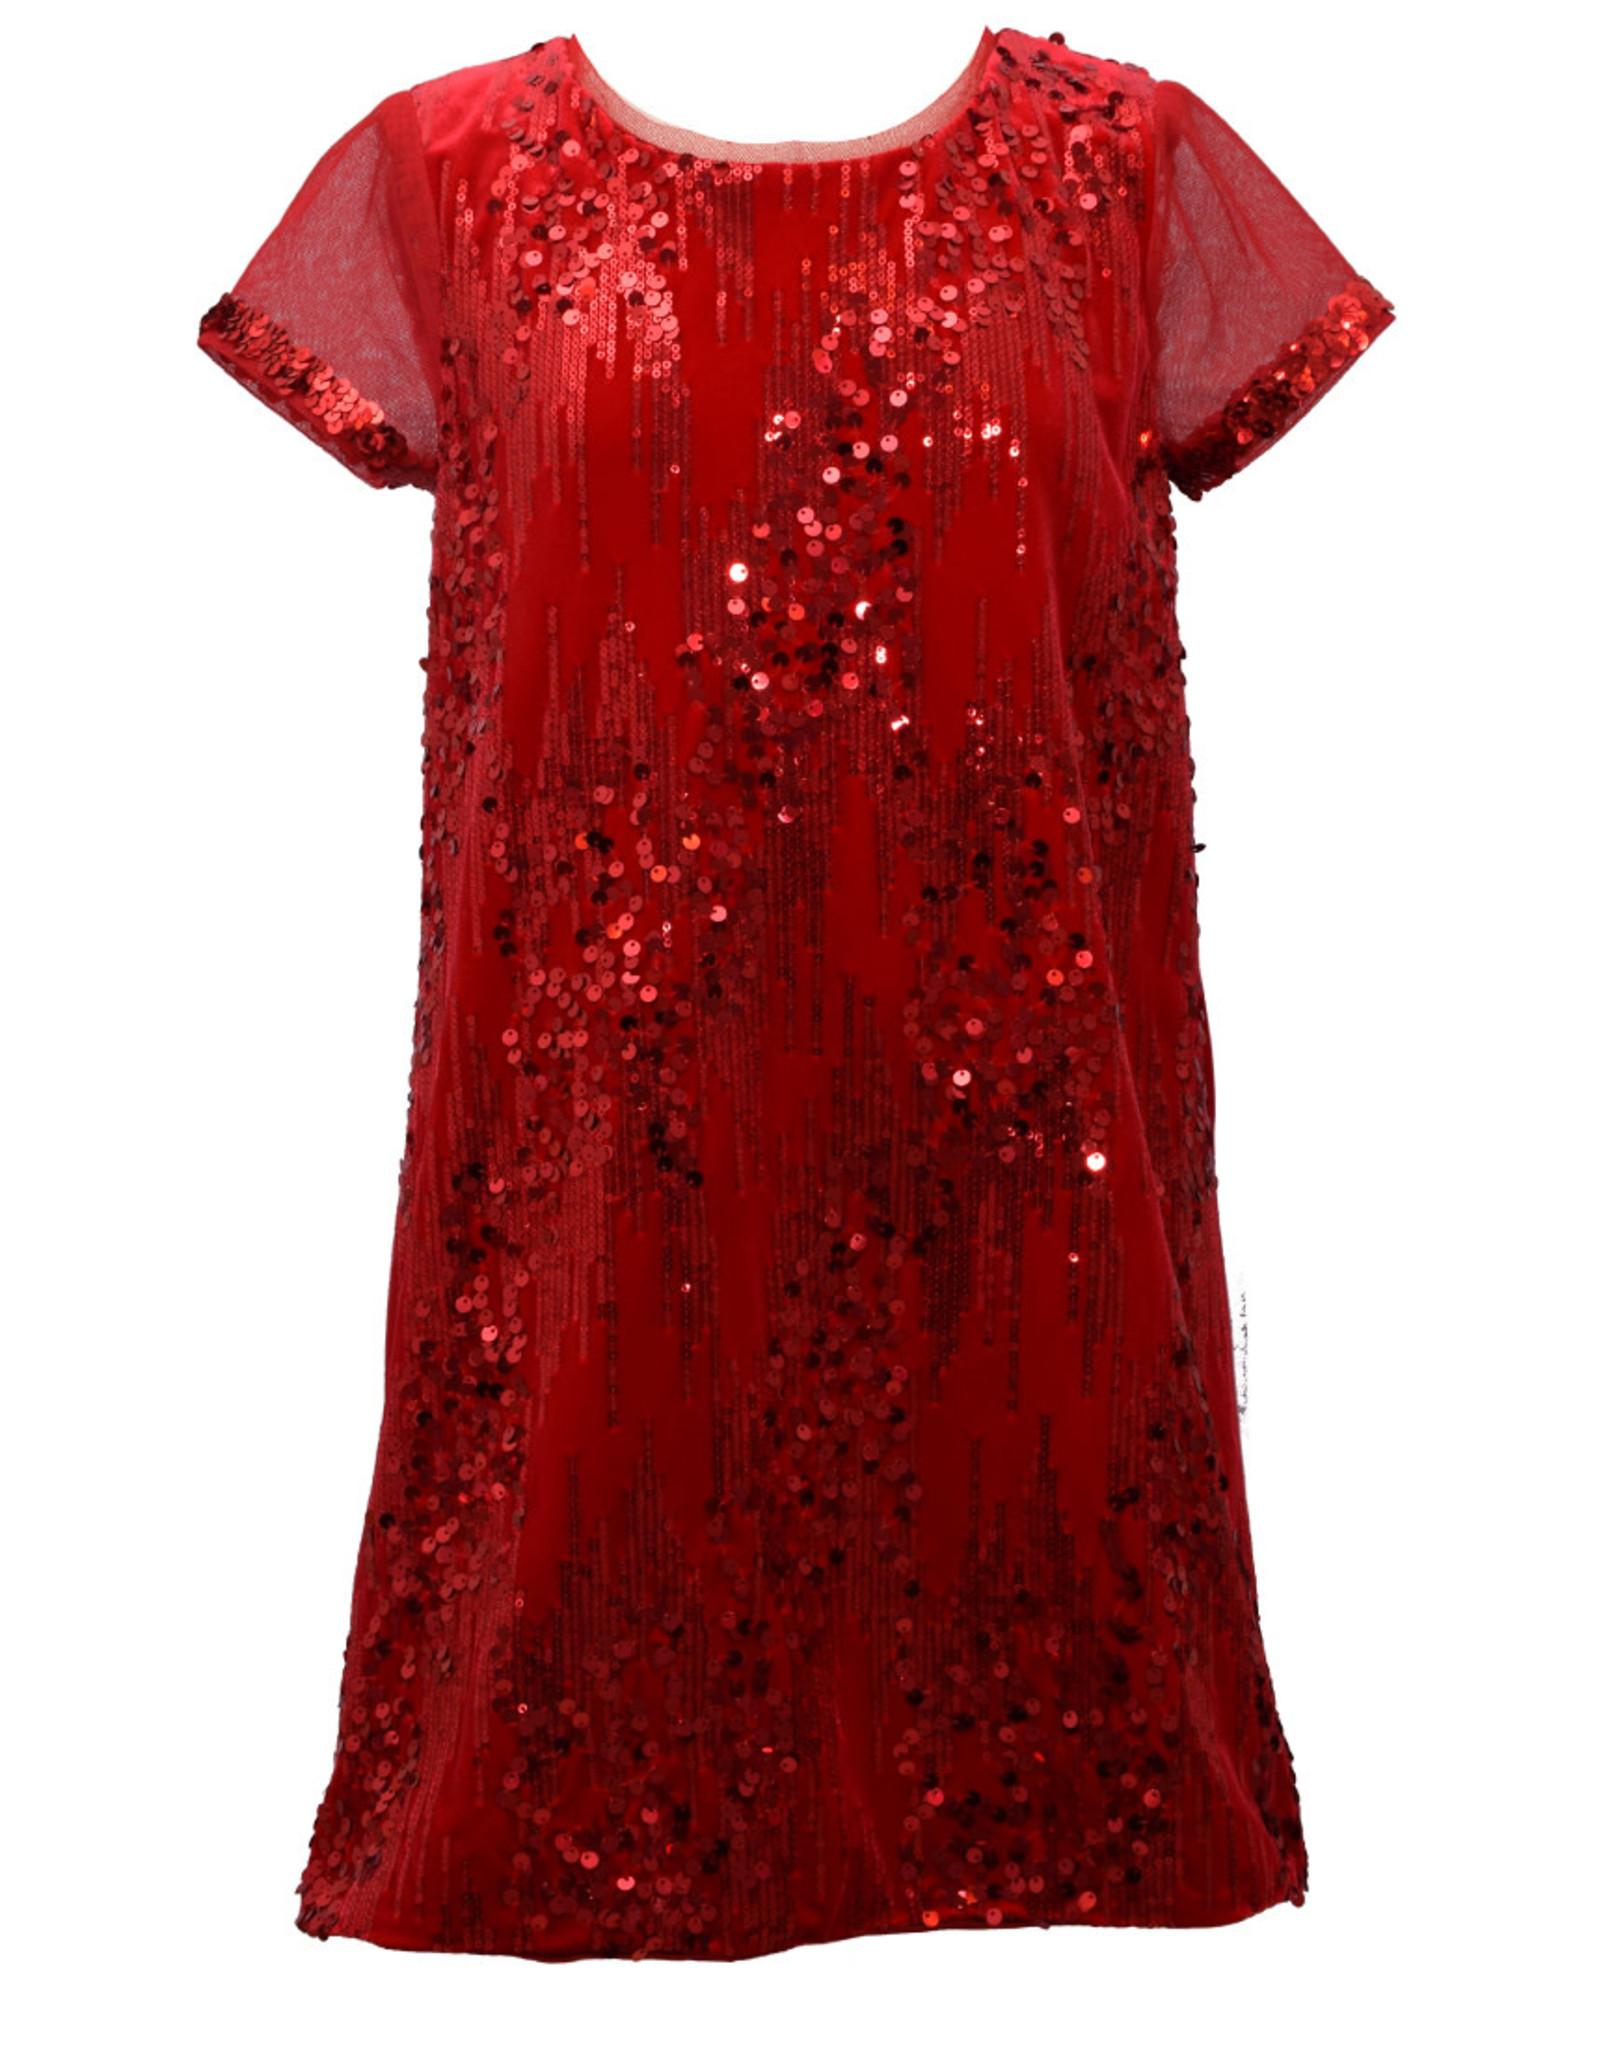 Bonnie  Jean Bonnie Jean- Red Sequin Dress